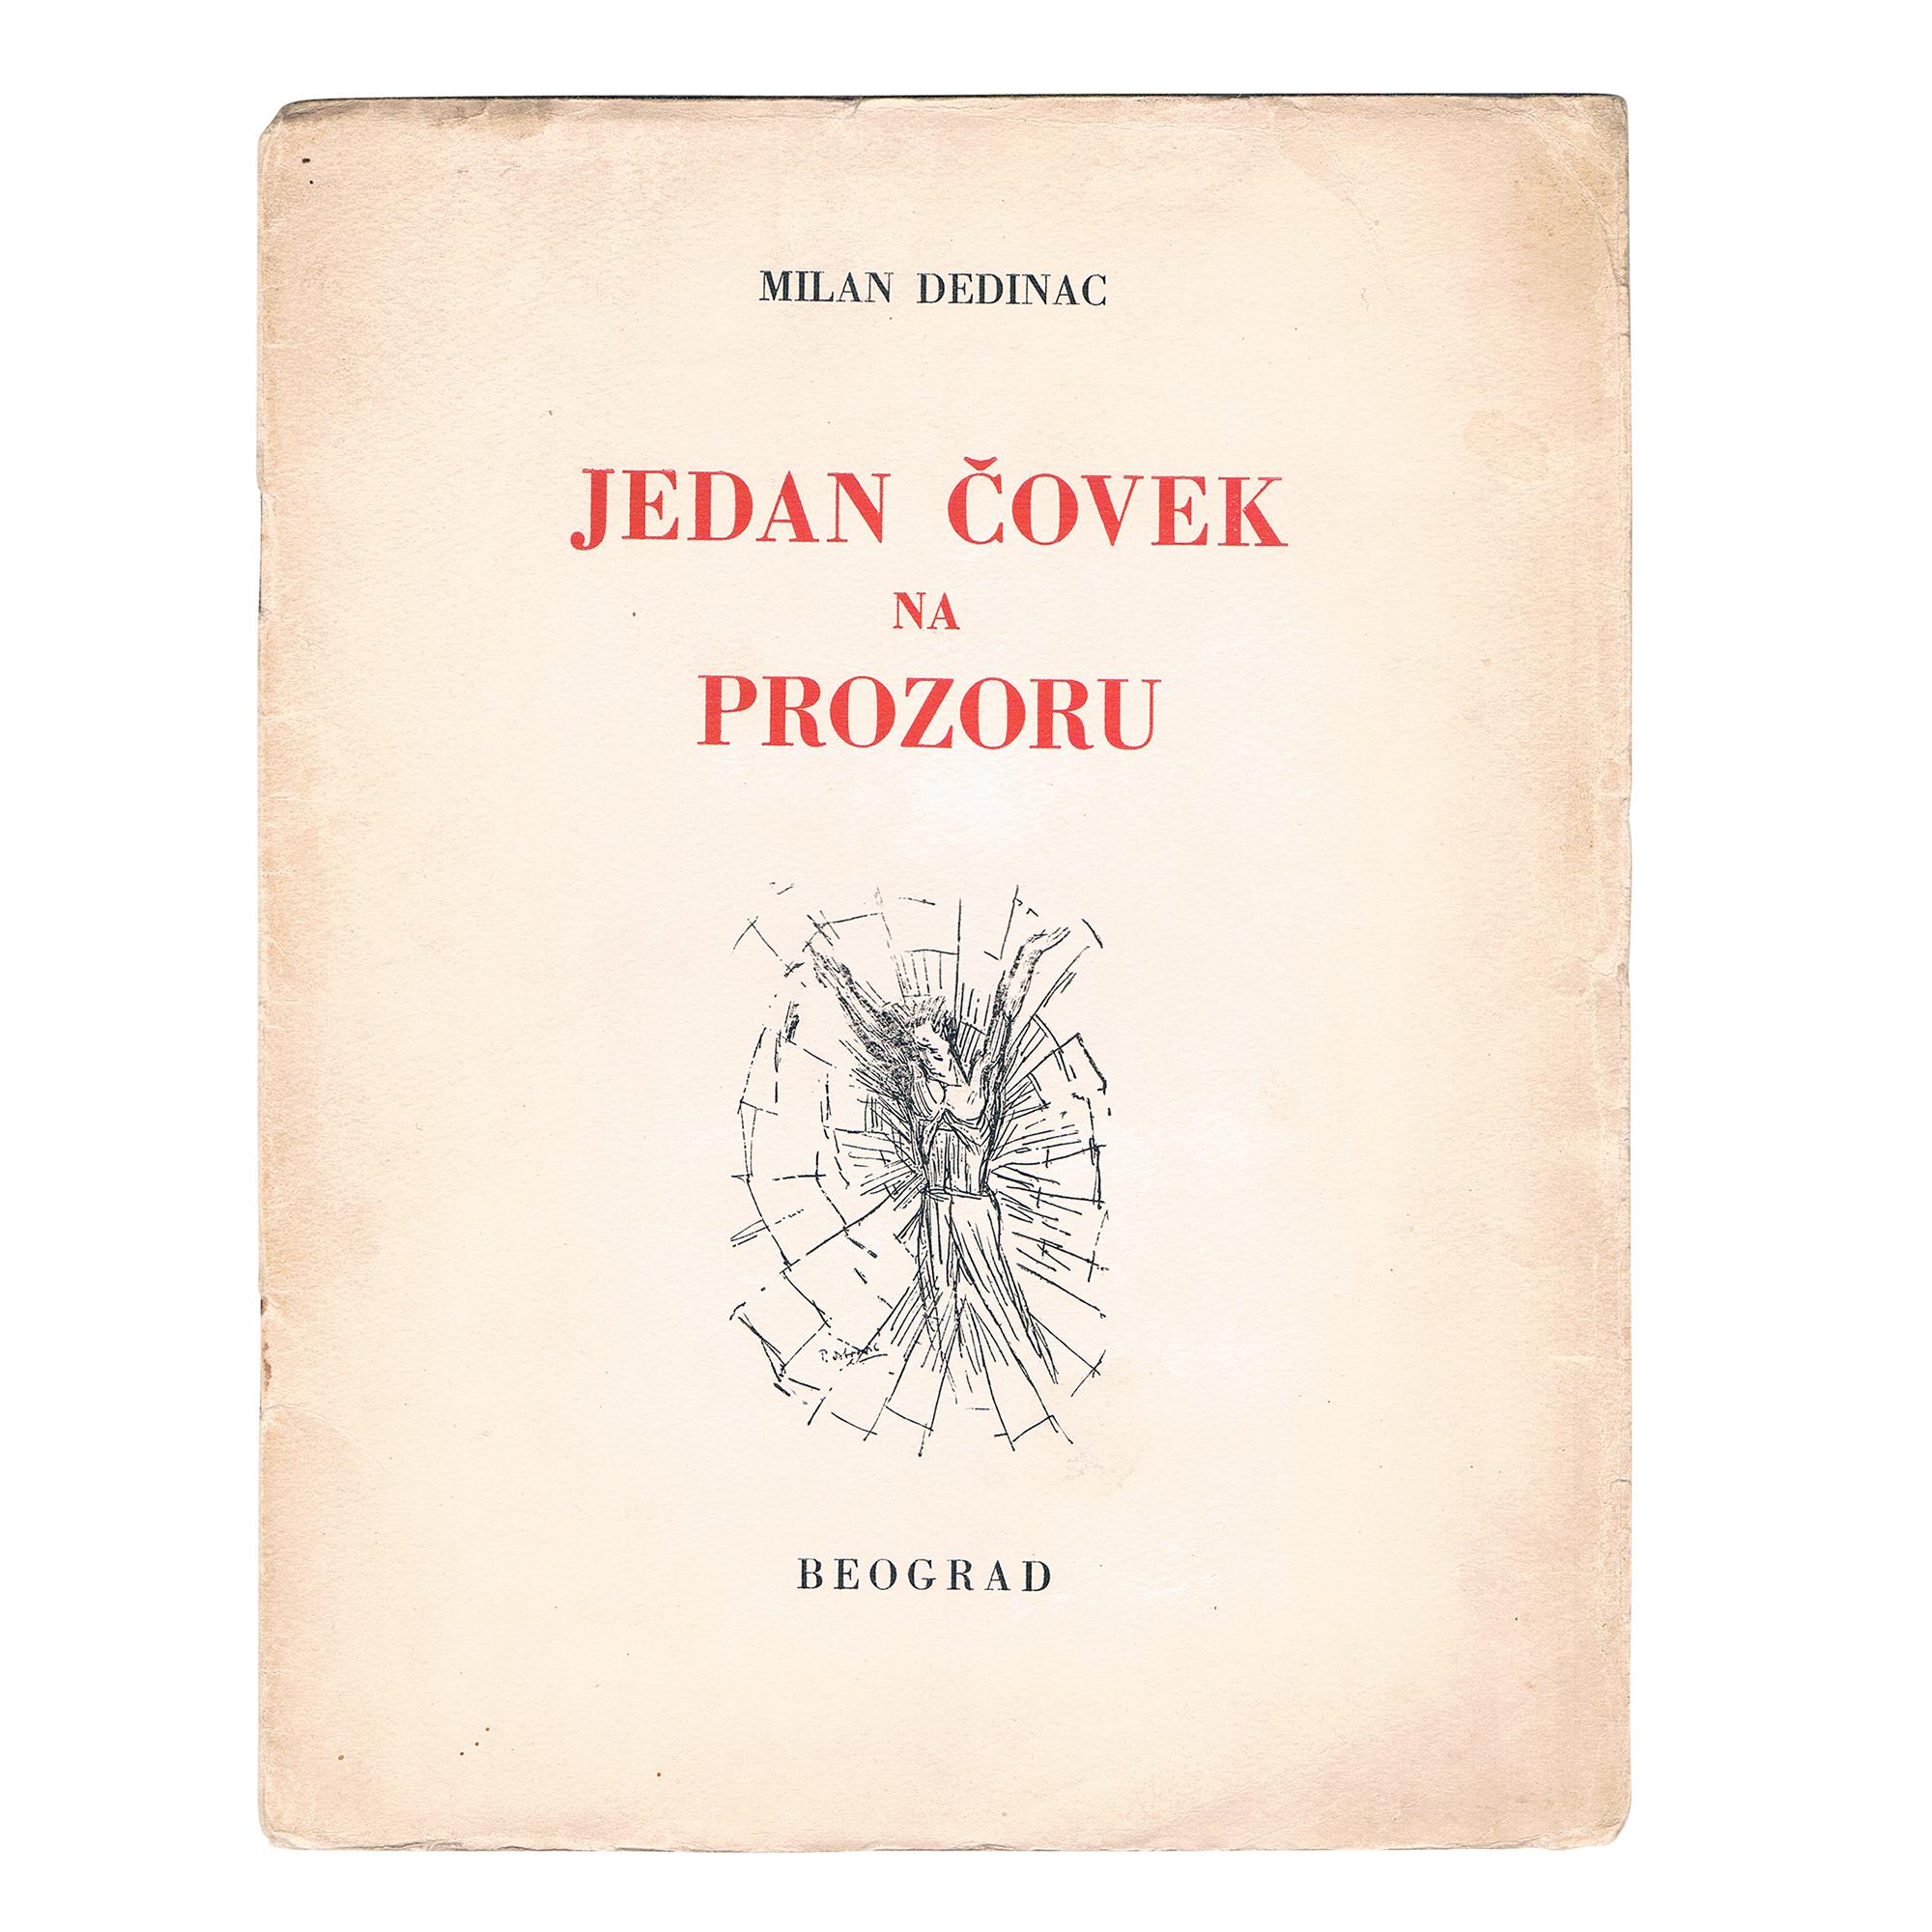 1143-Dedinac-Dobrovic-Covek-1937-1-frei_.jpg